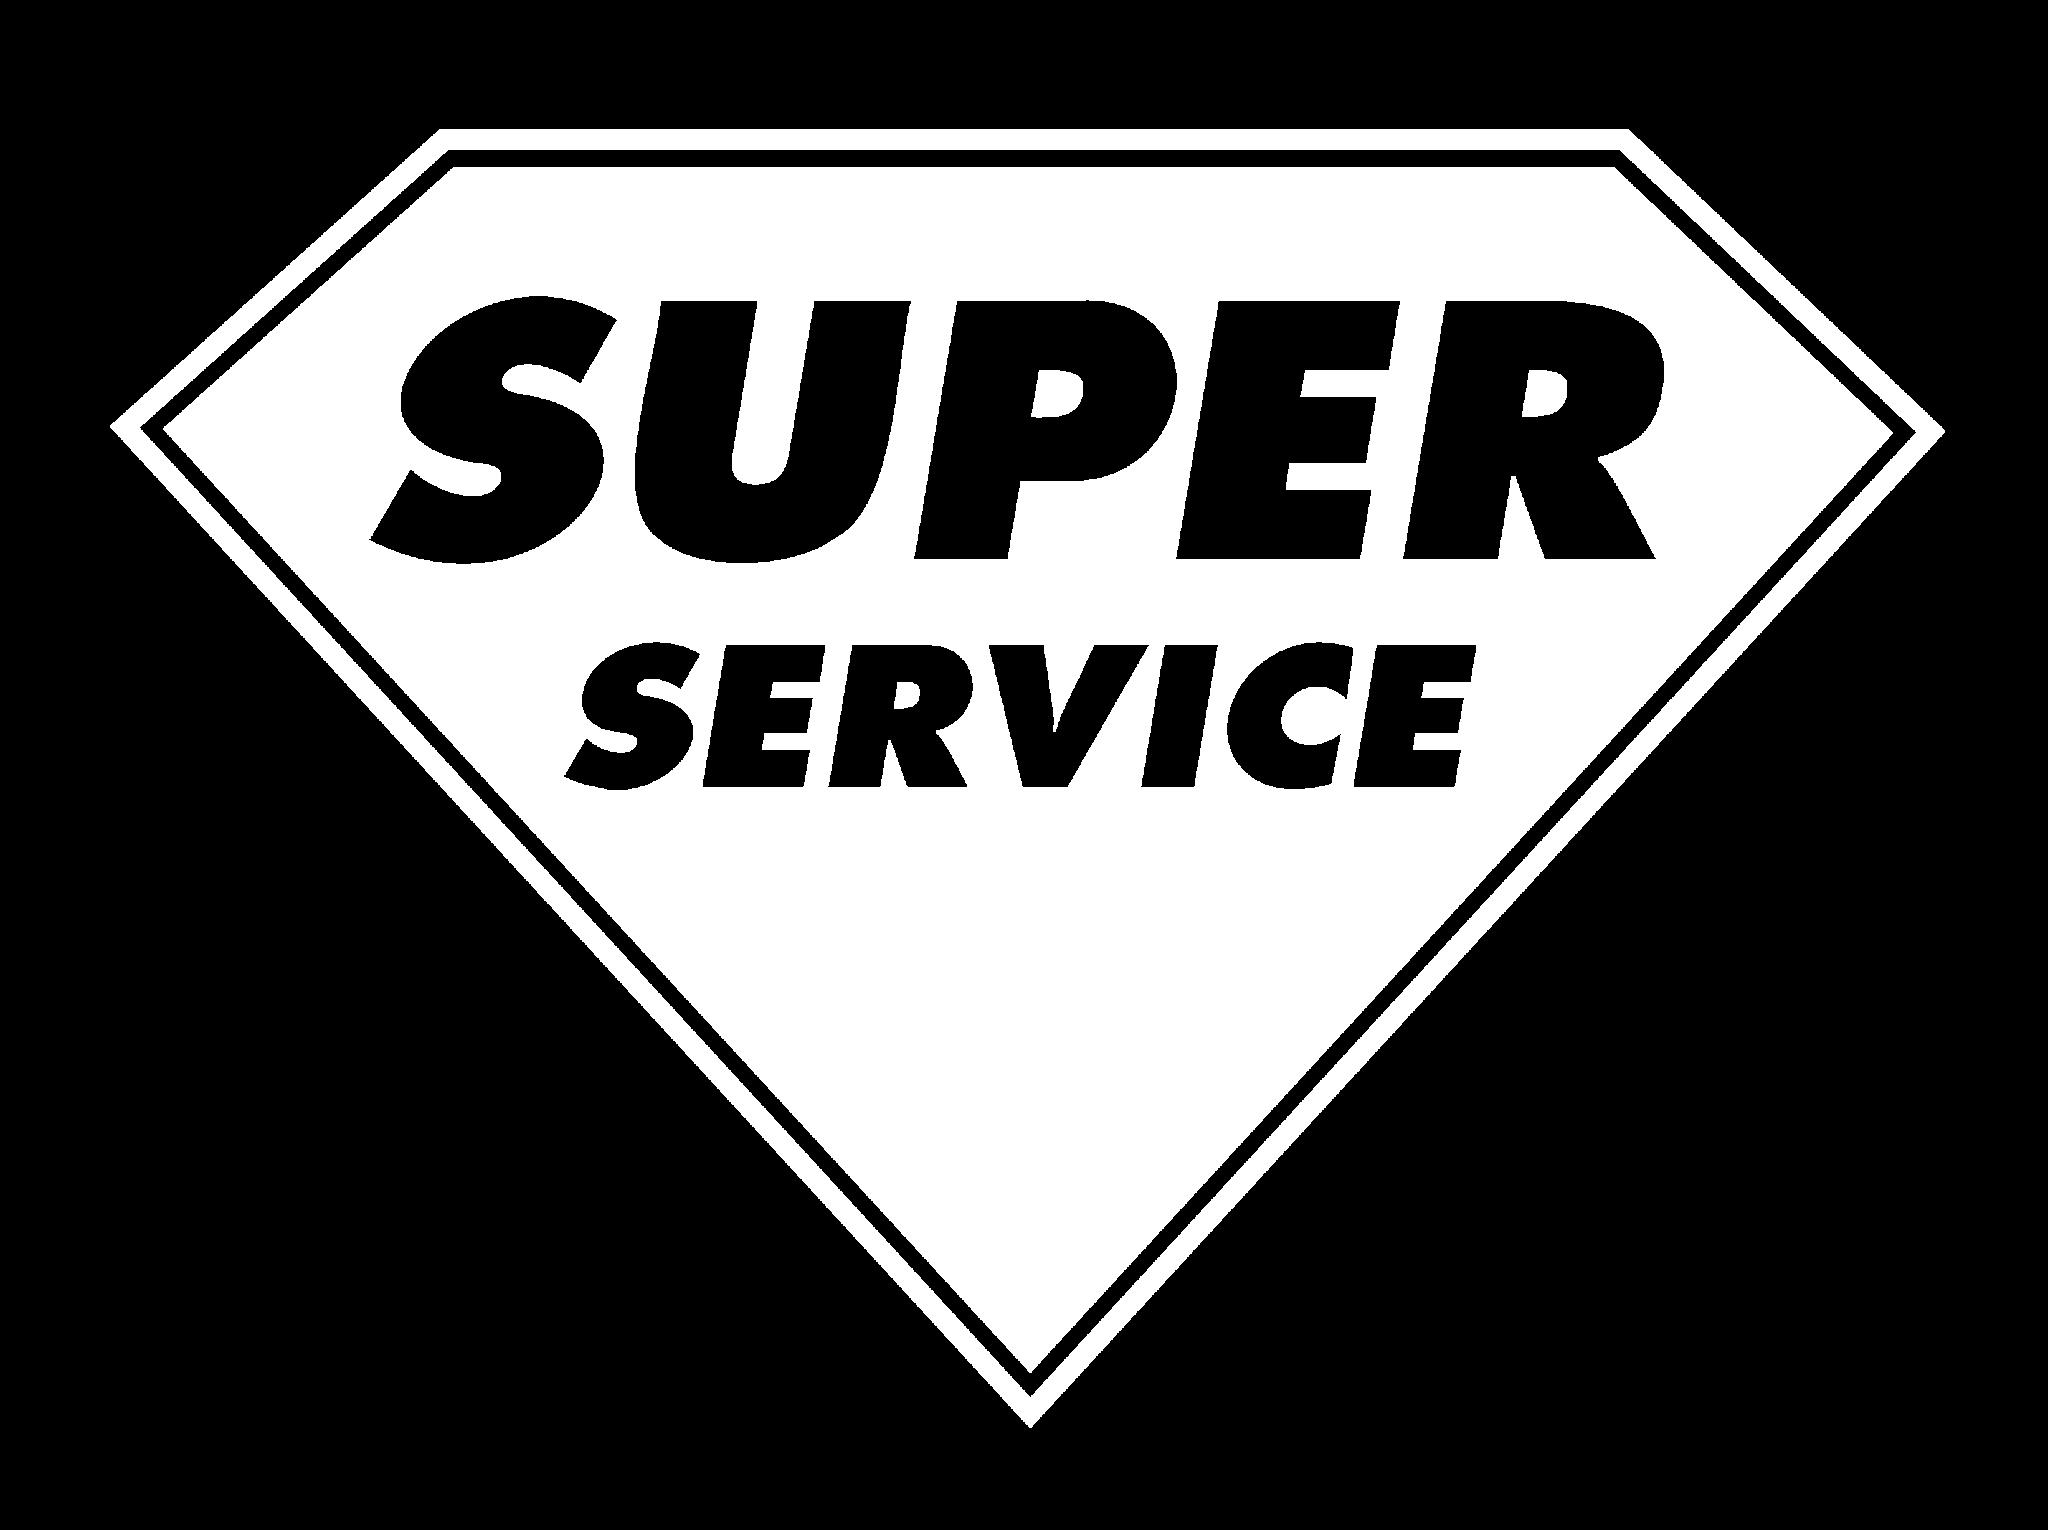 Super Service